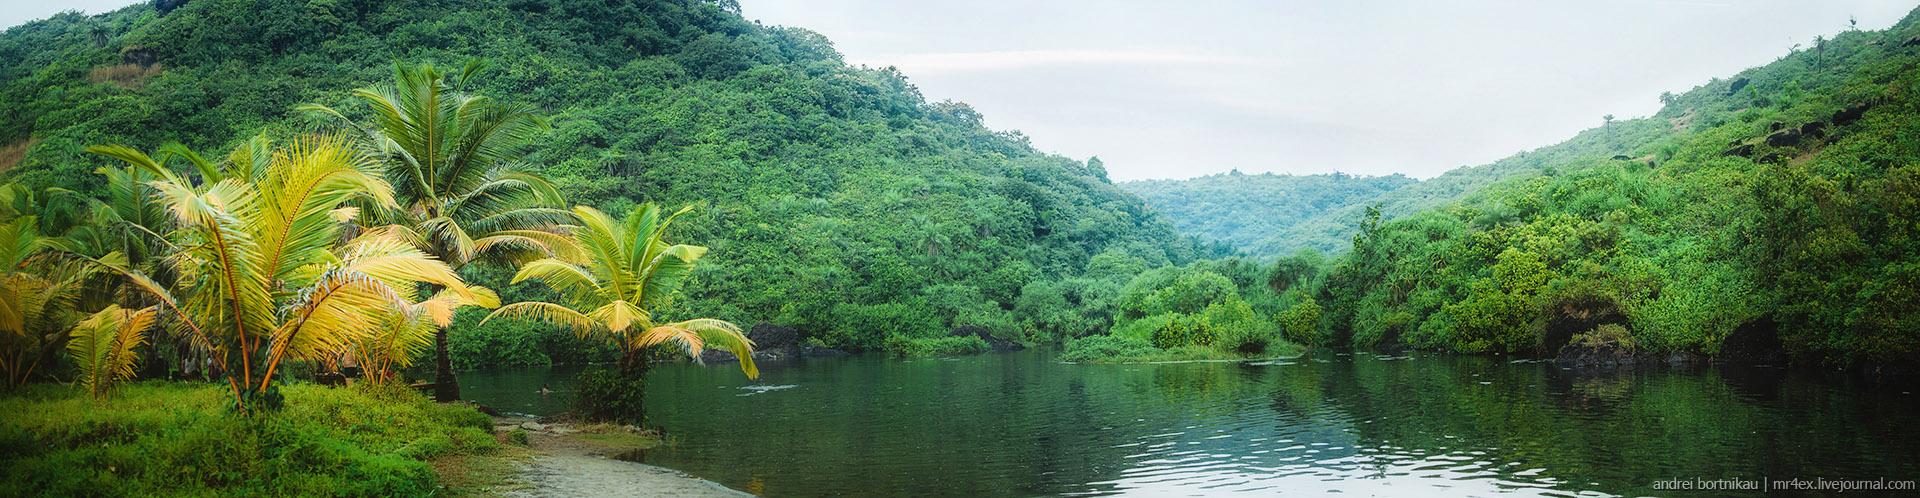 Озеро Арамболь, Калача, Sweet Lake, светлейк